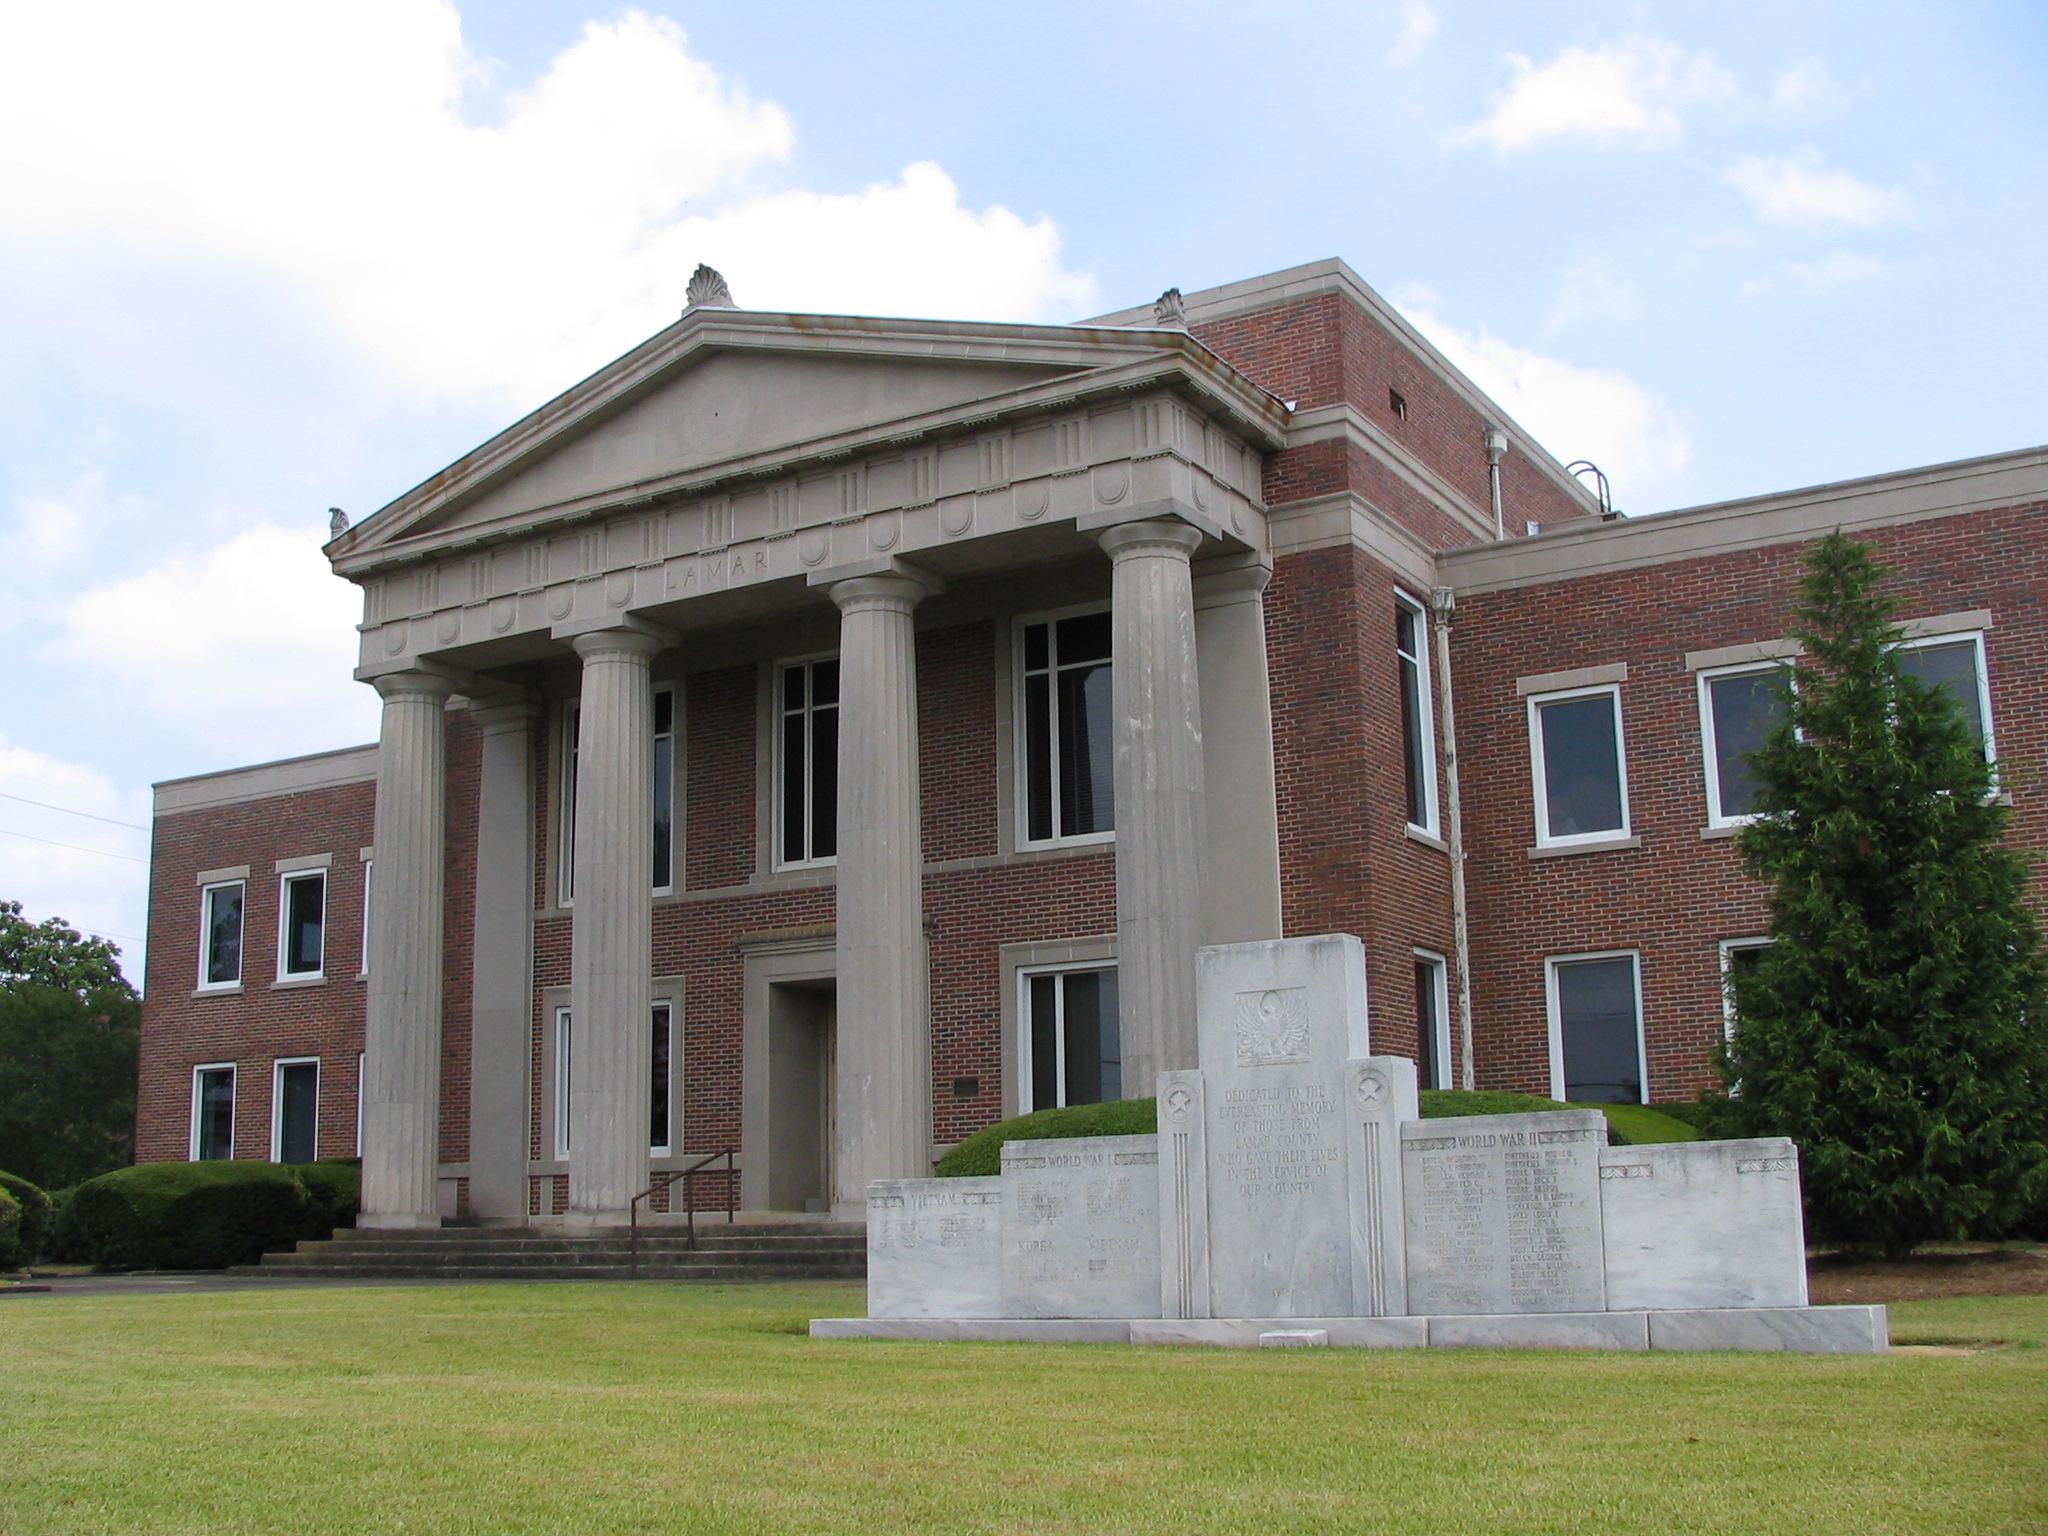 File:Lamar County Georgia Courthouse.jpg - Wikimedia Commonsbalance of lamar county